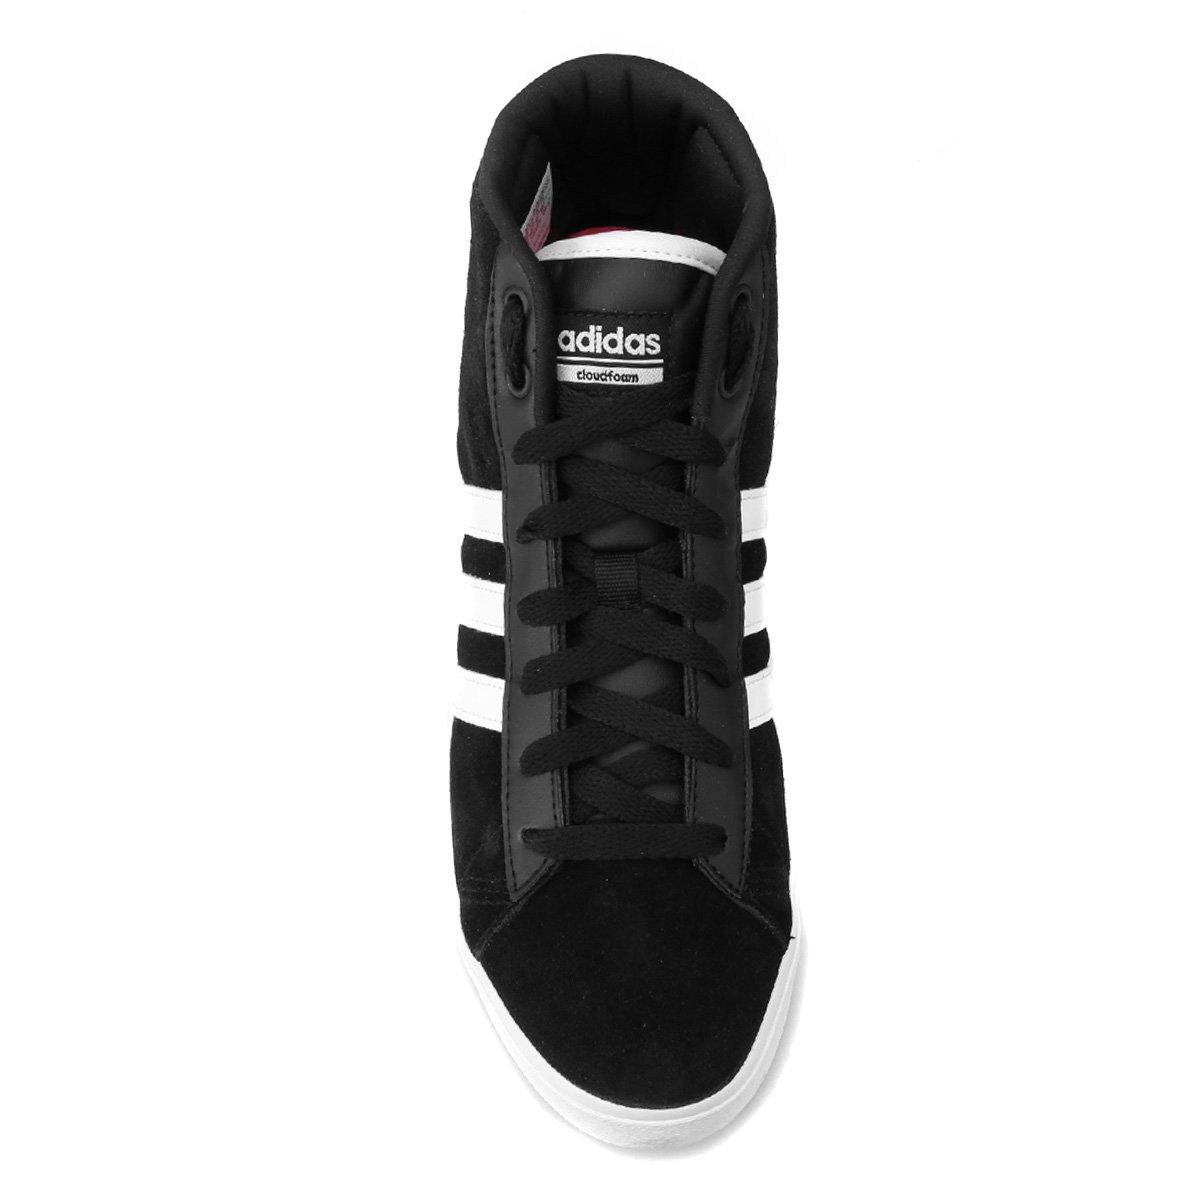 Tênis Adidas Cf Daily Qt Mid Feminino - Preto e Branco - Compre ... e97c174b58a1c